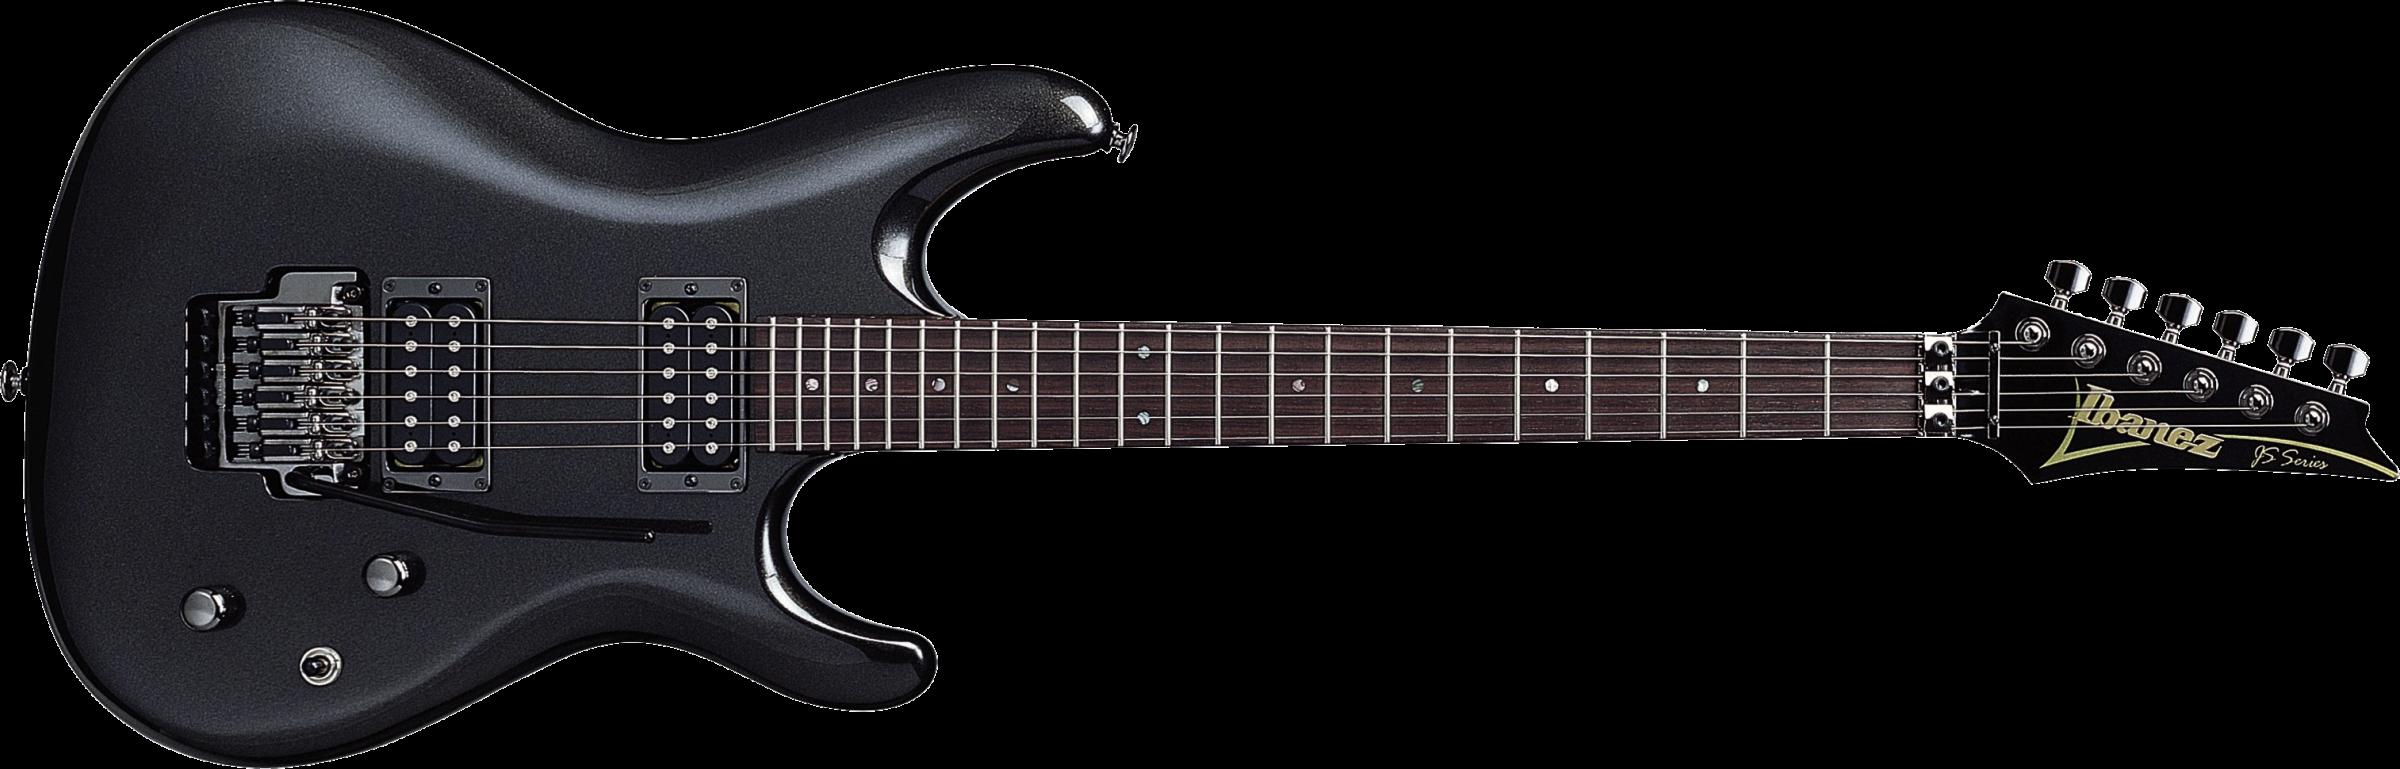 Ibanez JS1000 signature Joe Satriani